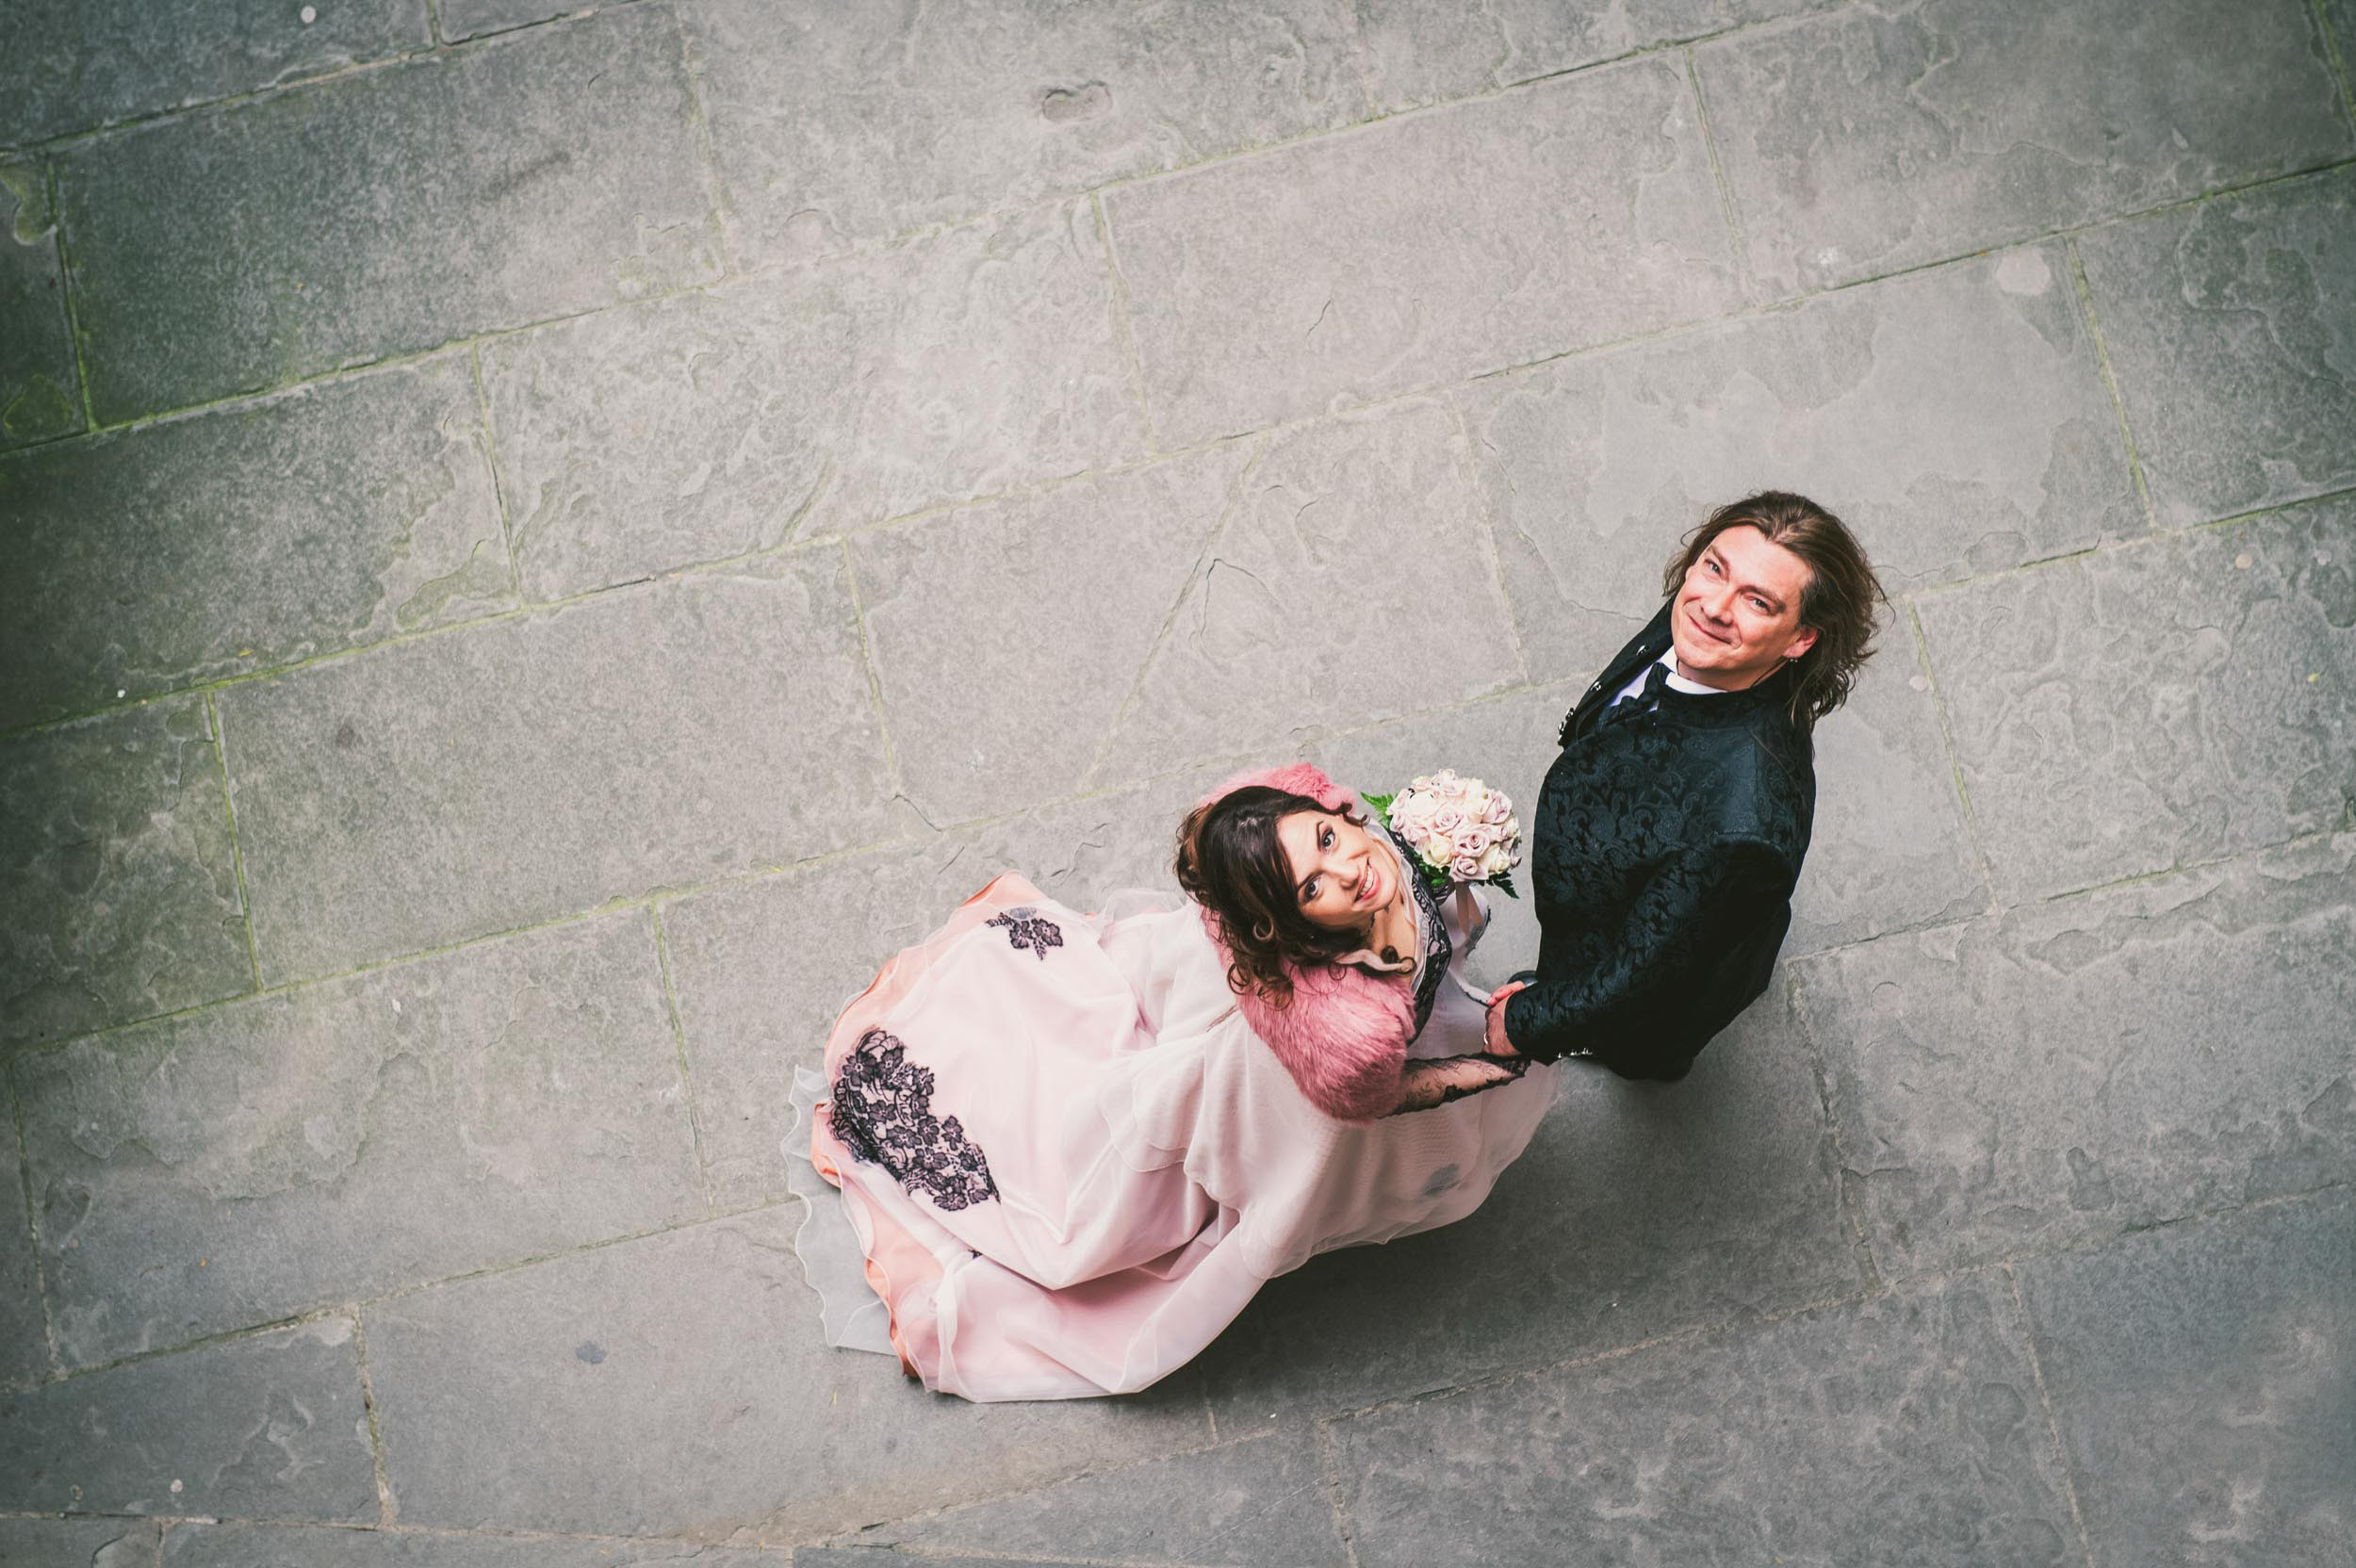 Barbara & Paolo - Rock Wedding in Florence, 12/03/2016